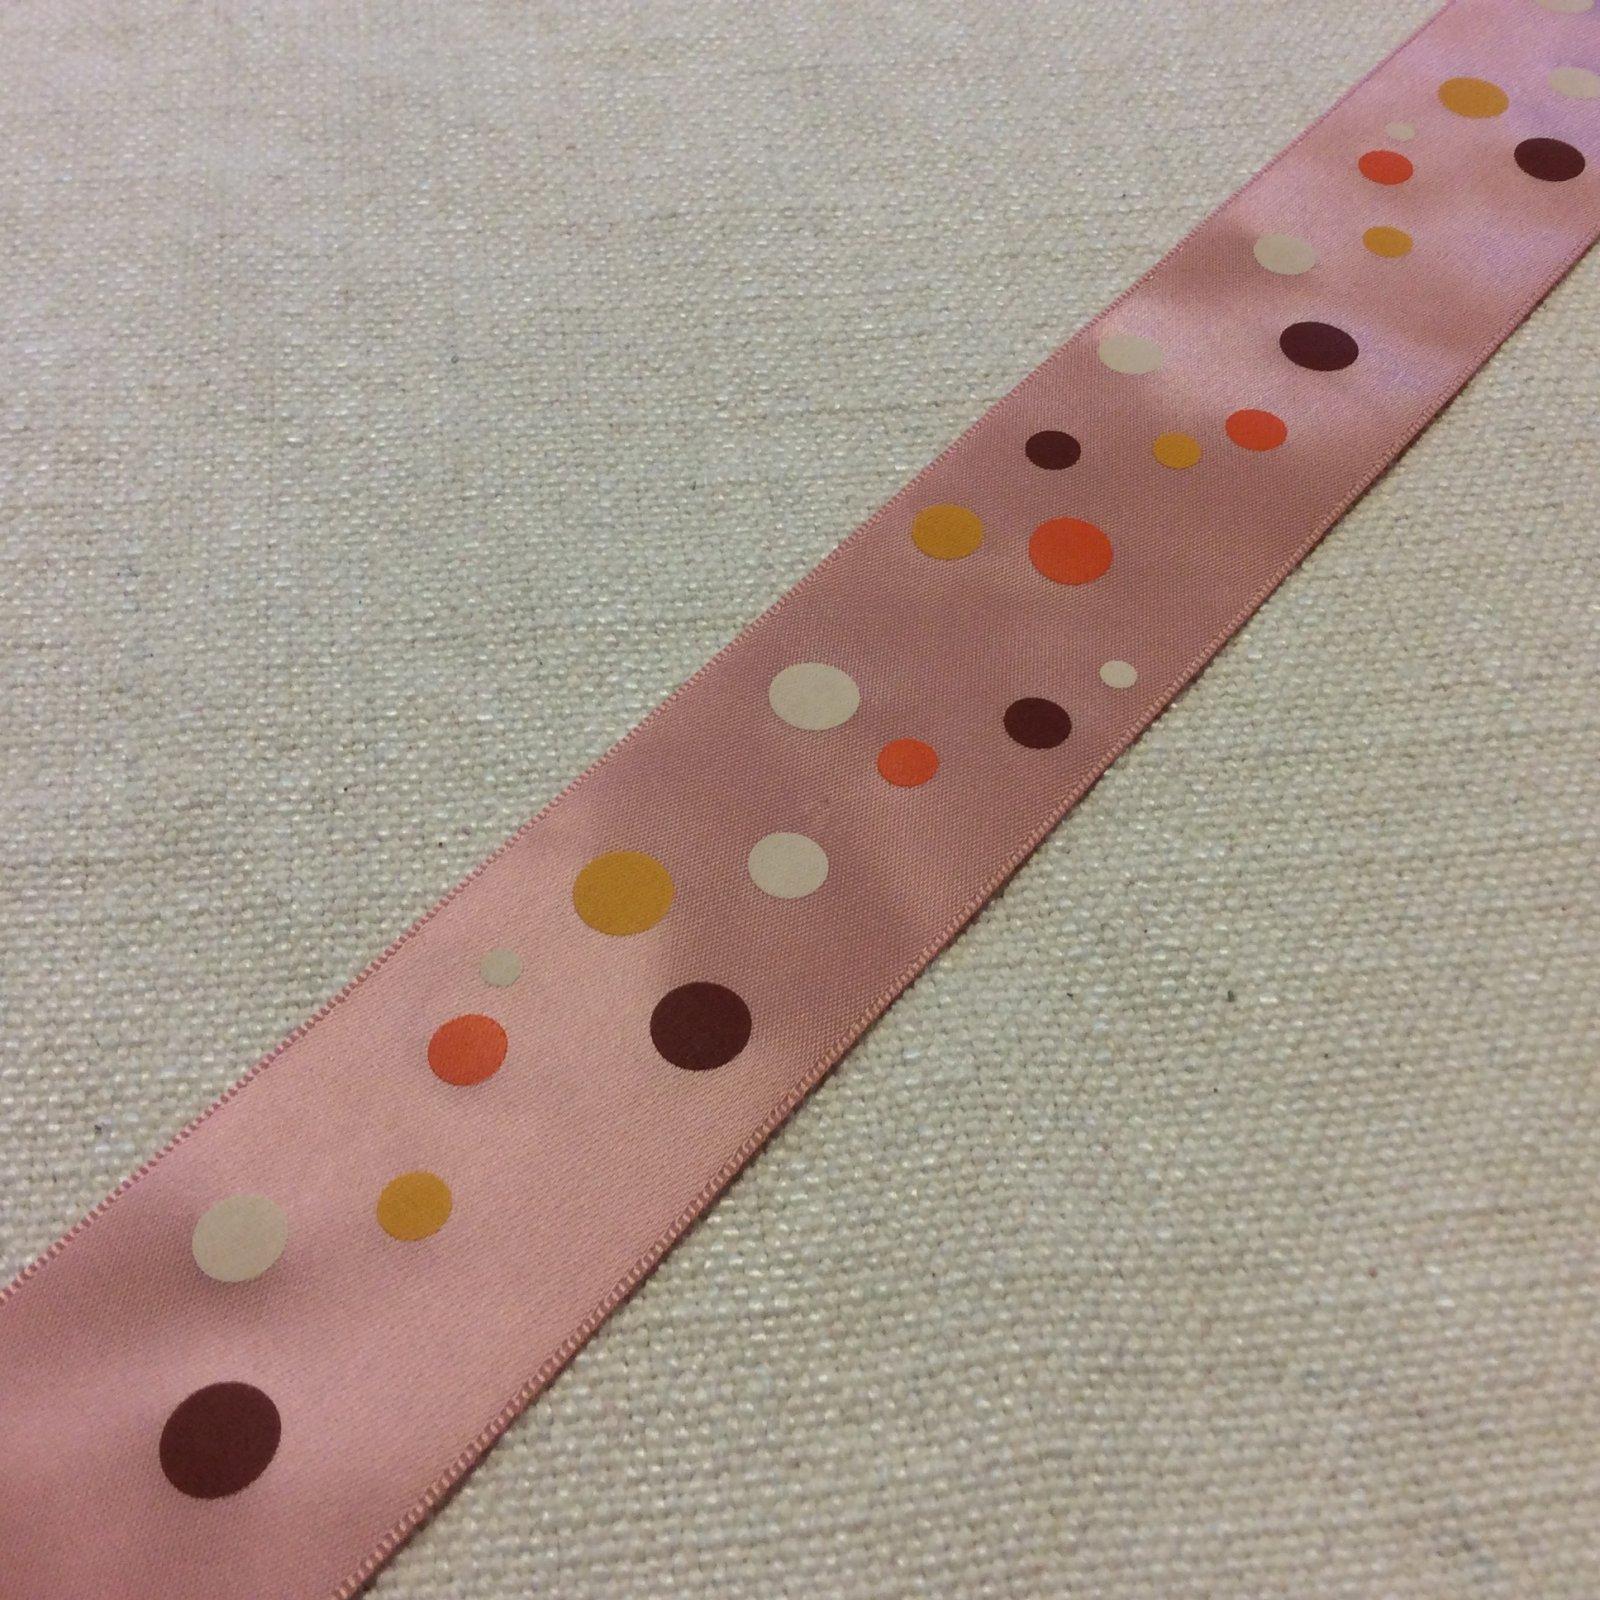 Satin Ribbon 1.5 Pink Polka Dots yellow Orange White Trim Ribbon RIB1270